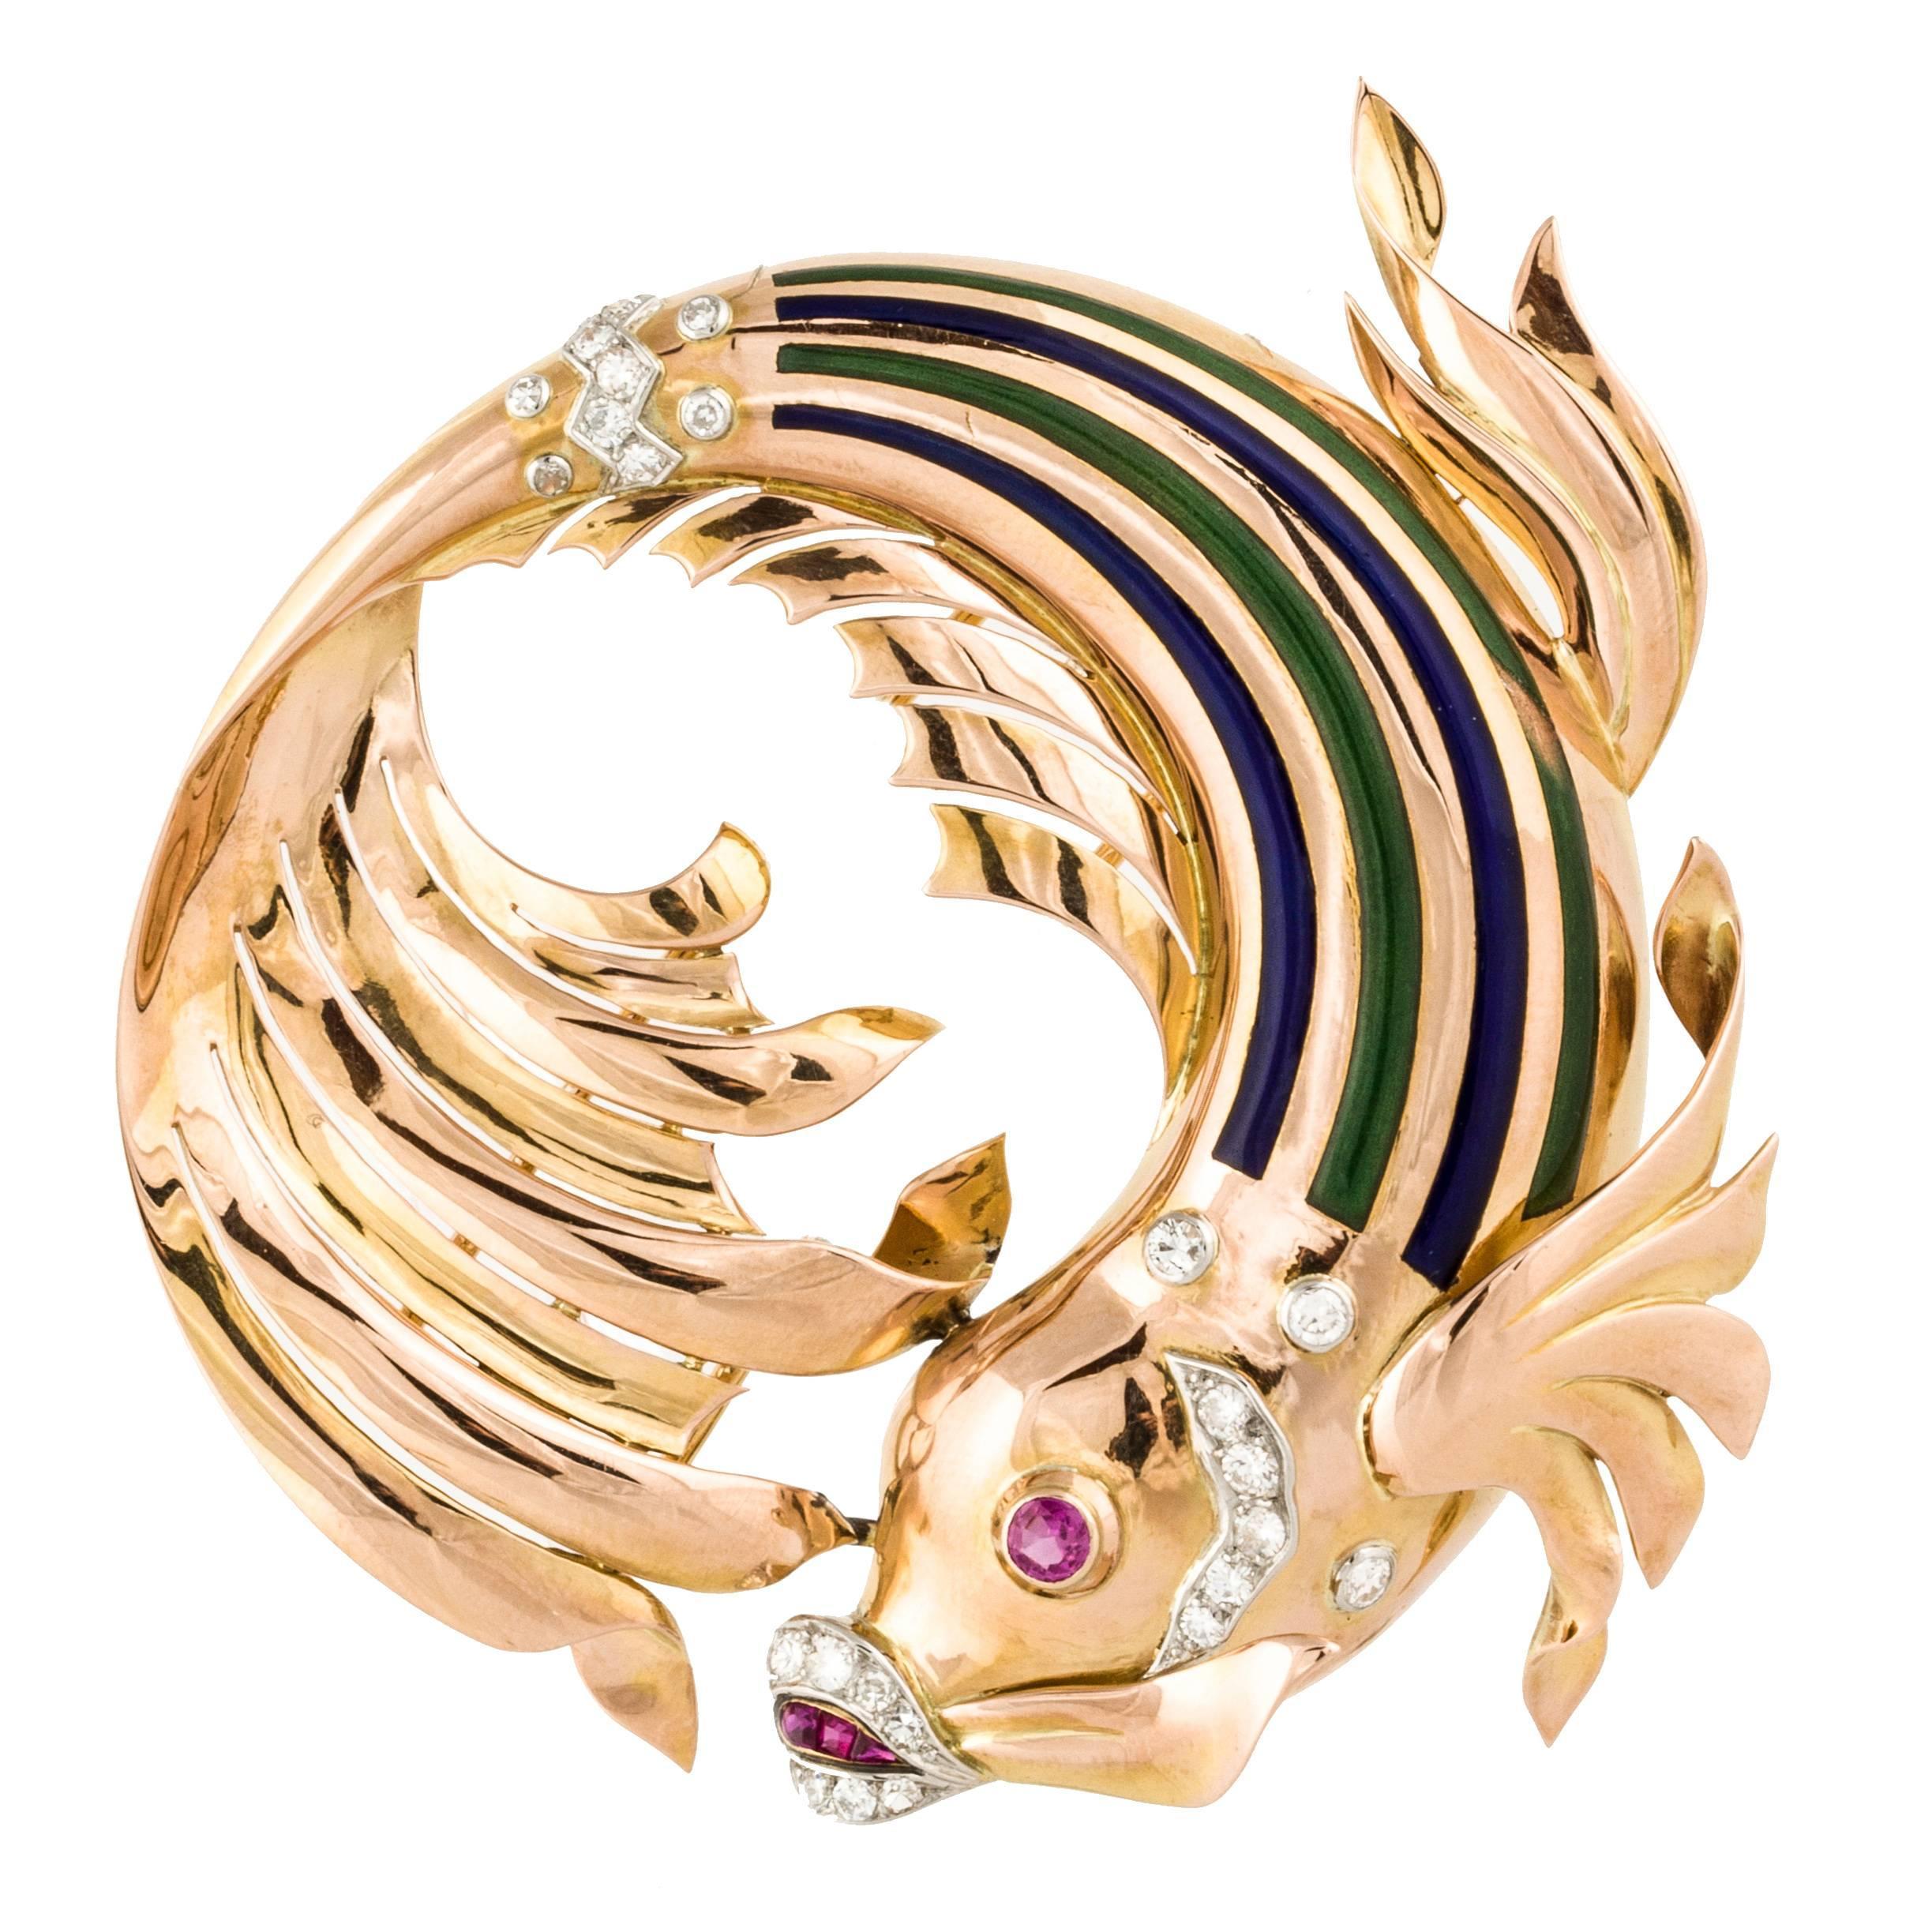 Retro 18K Rose Gold and Enamel Fish Pin